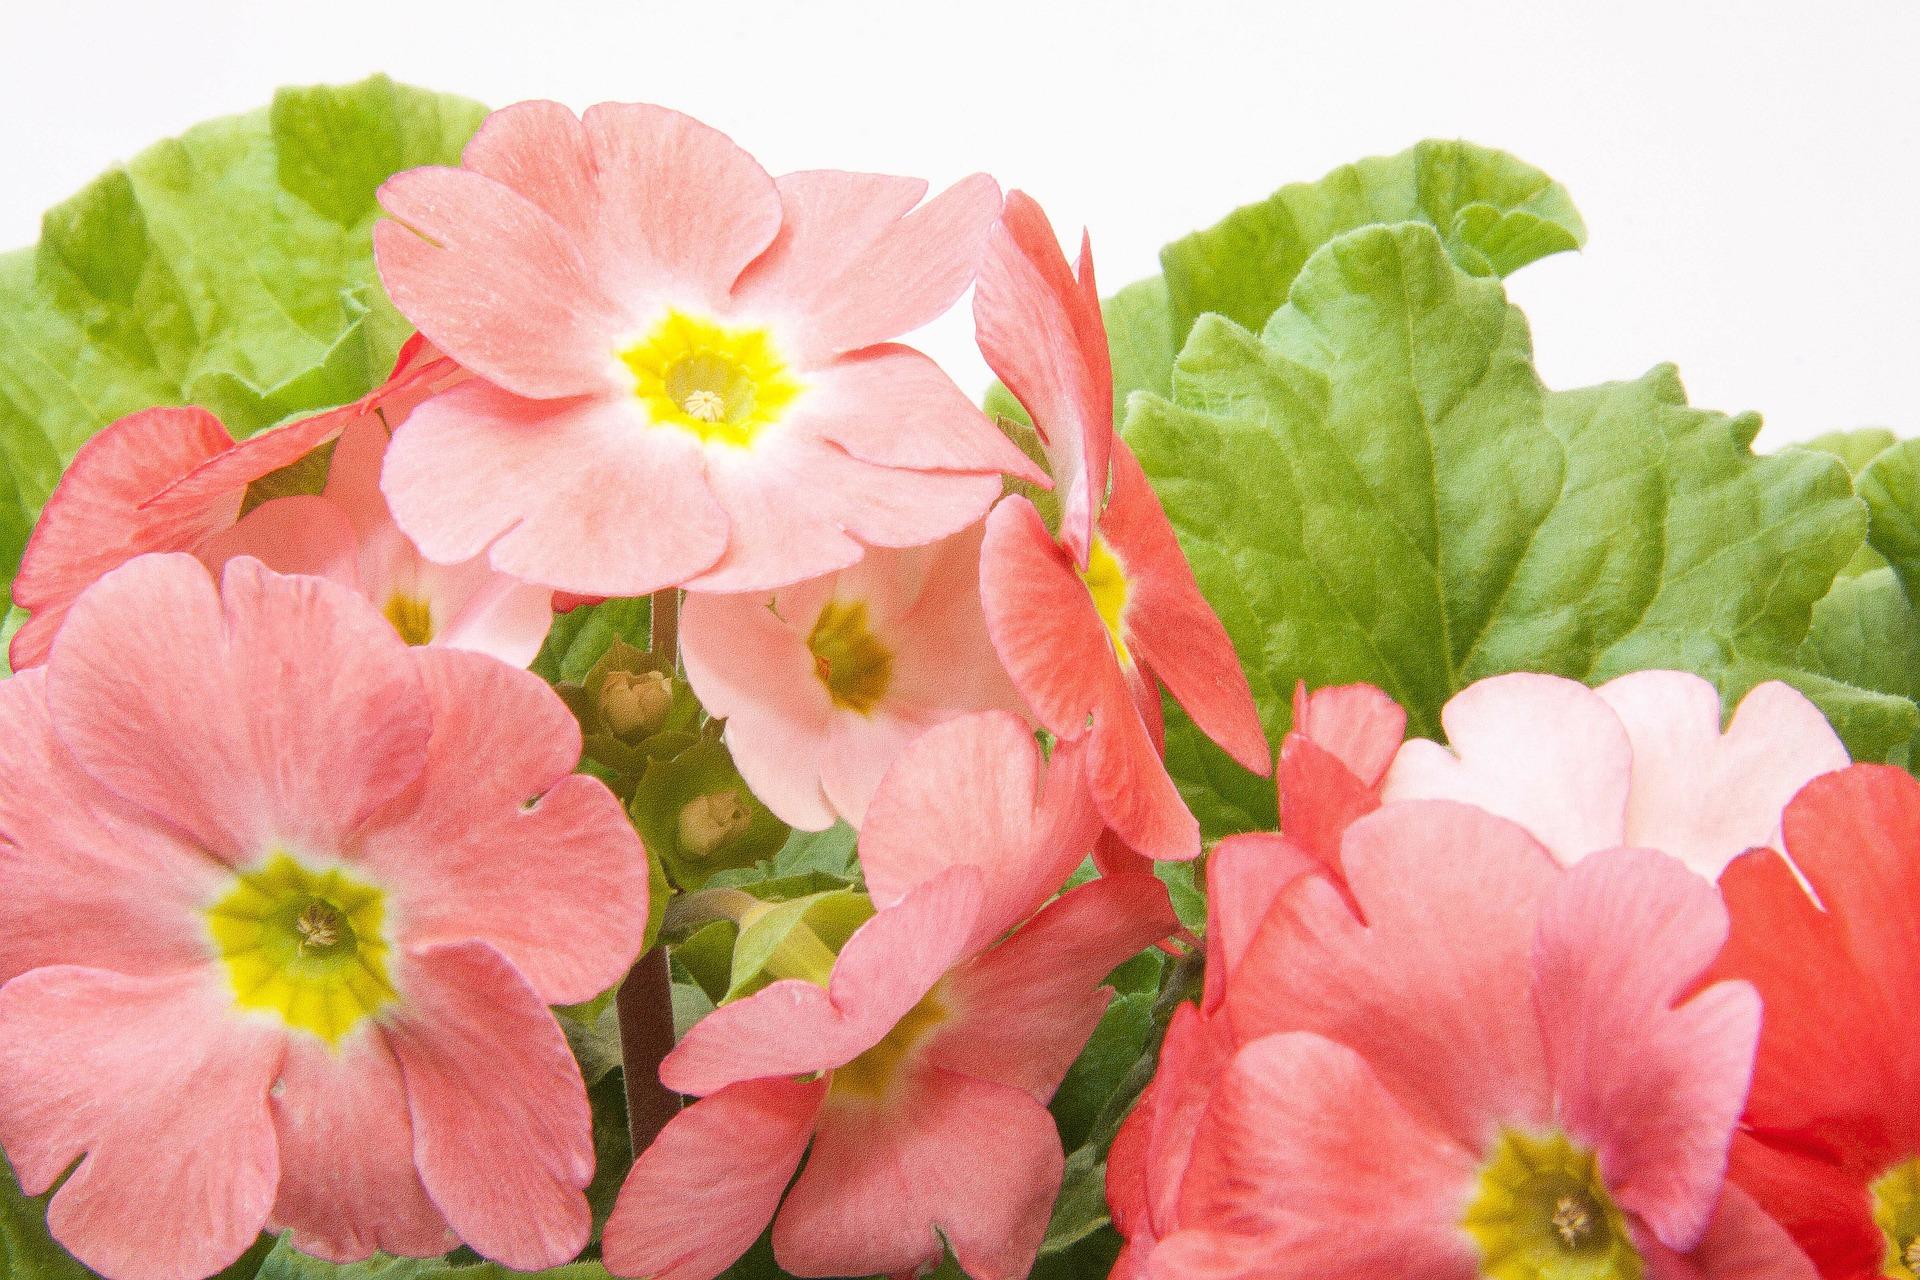 fresh primroses nature prim garden primrose hq photo - Prim Garden